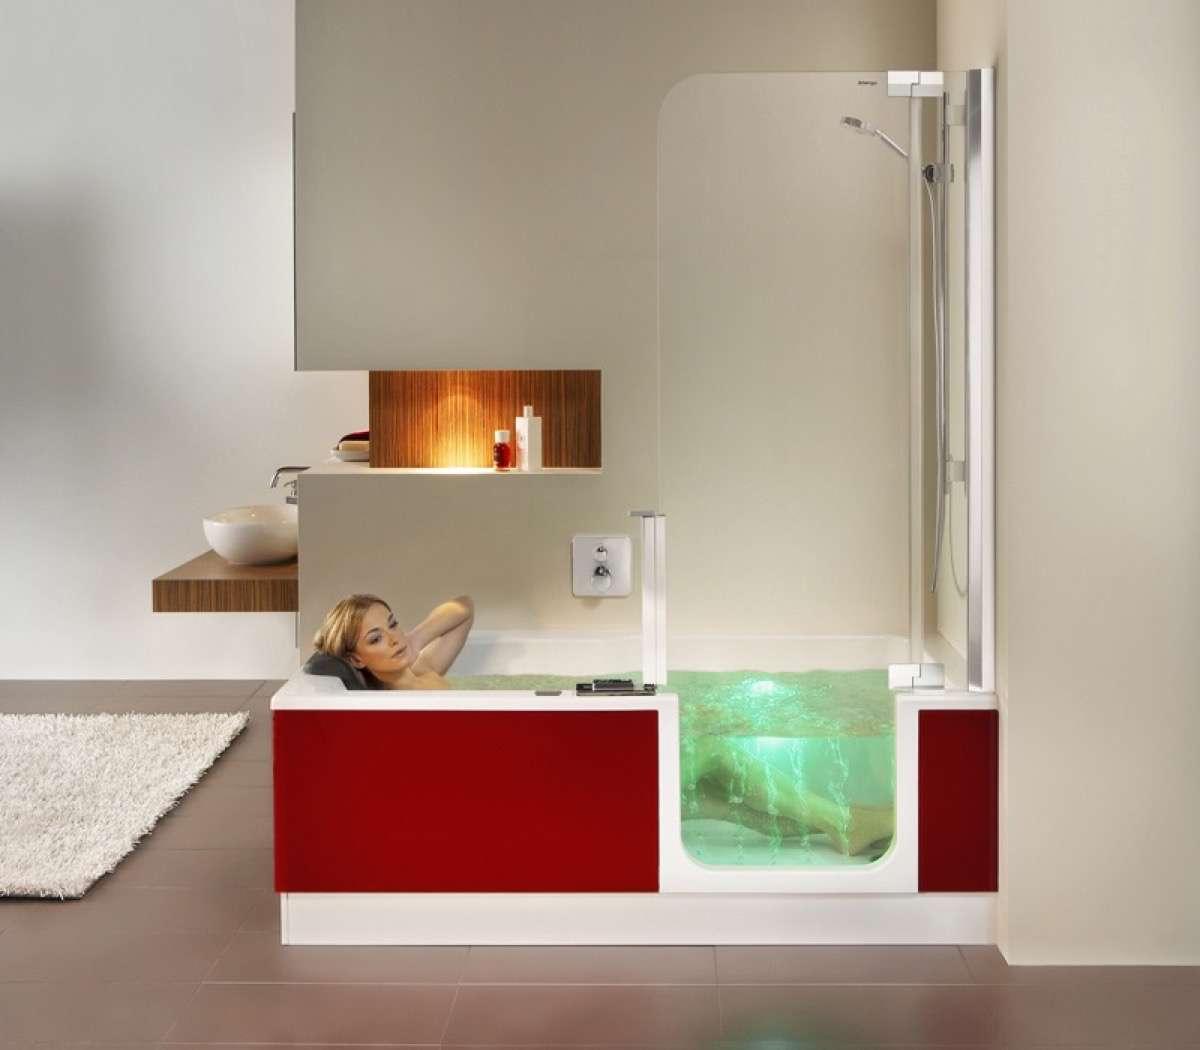 bañera con ducha